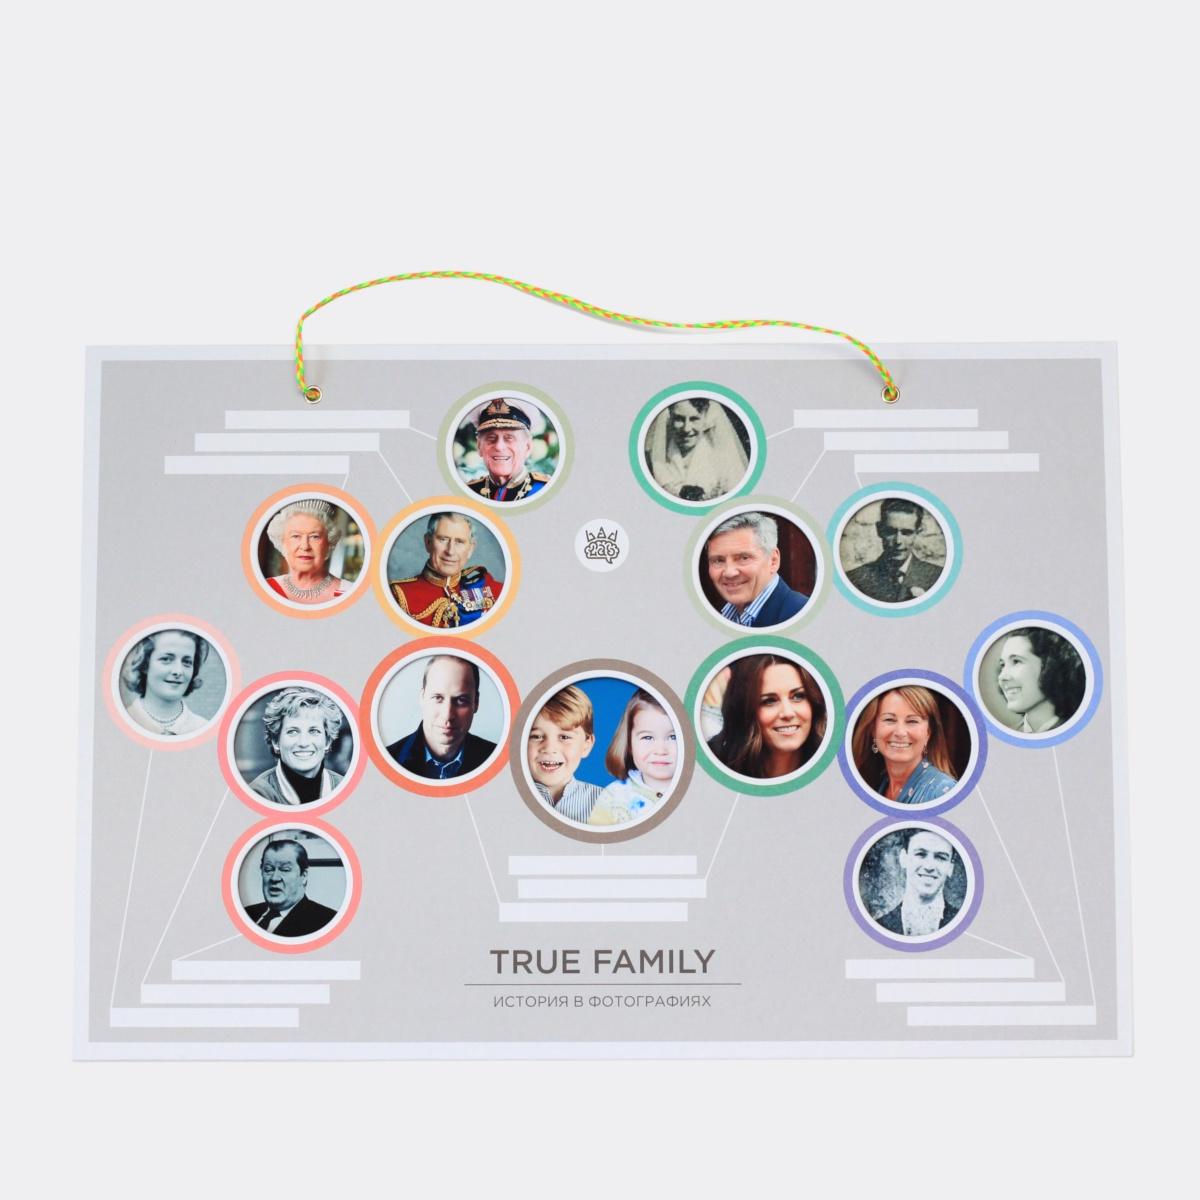 Фоторамка BADLAB True Family, Бумага, Картон